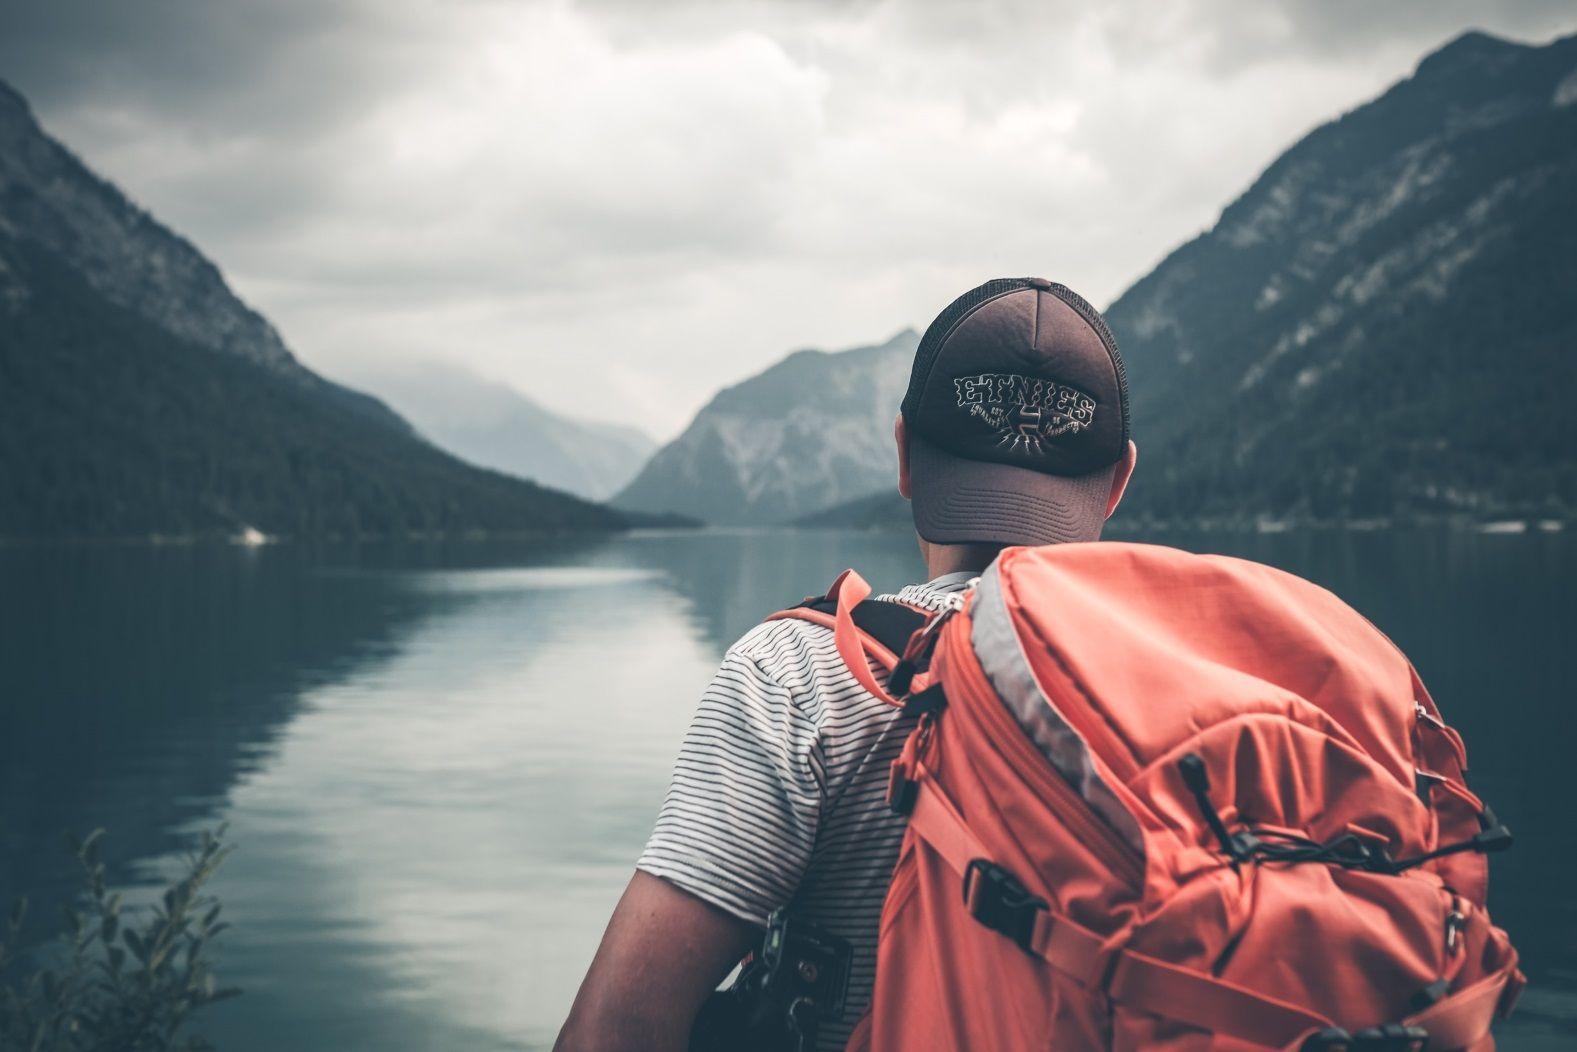 путешествие, турист